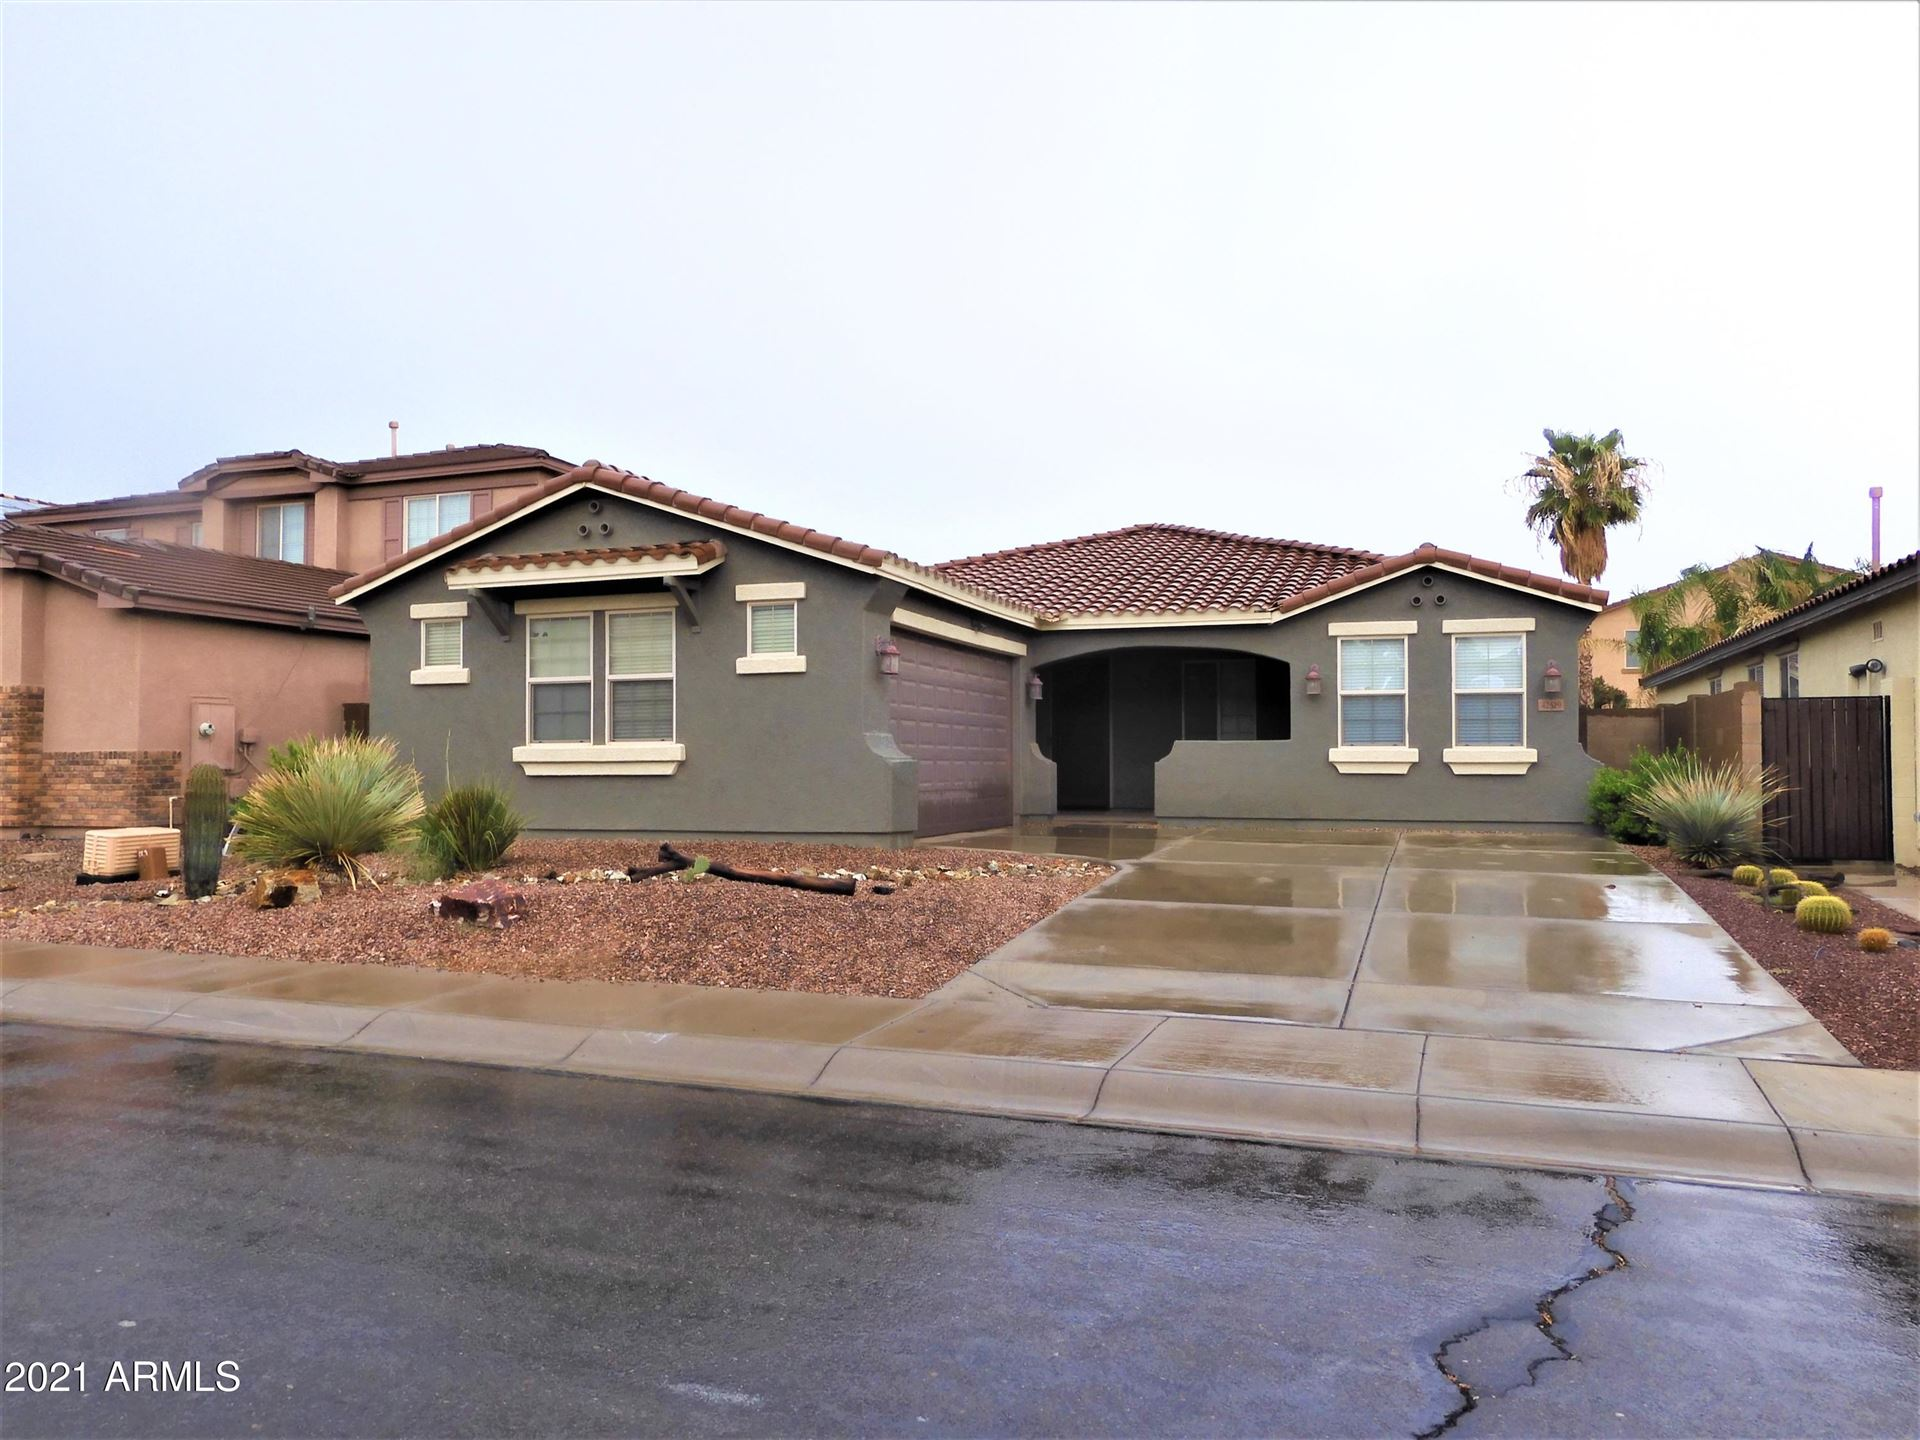 Photo for 42519 W Cheyenne Drive, Maricopa, AZ 85138 (MLS # 6276705)